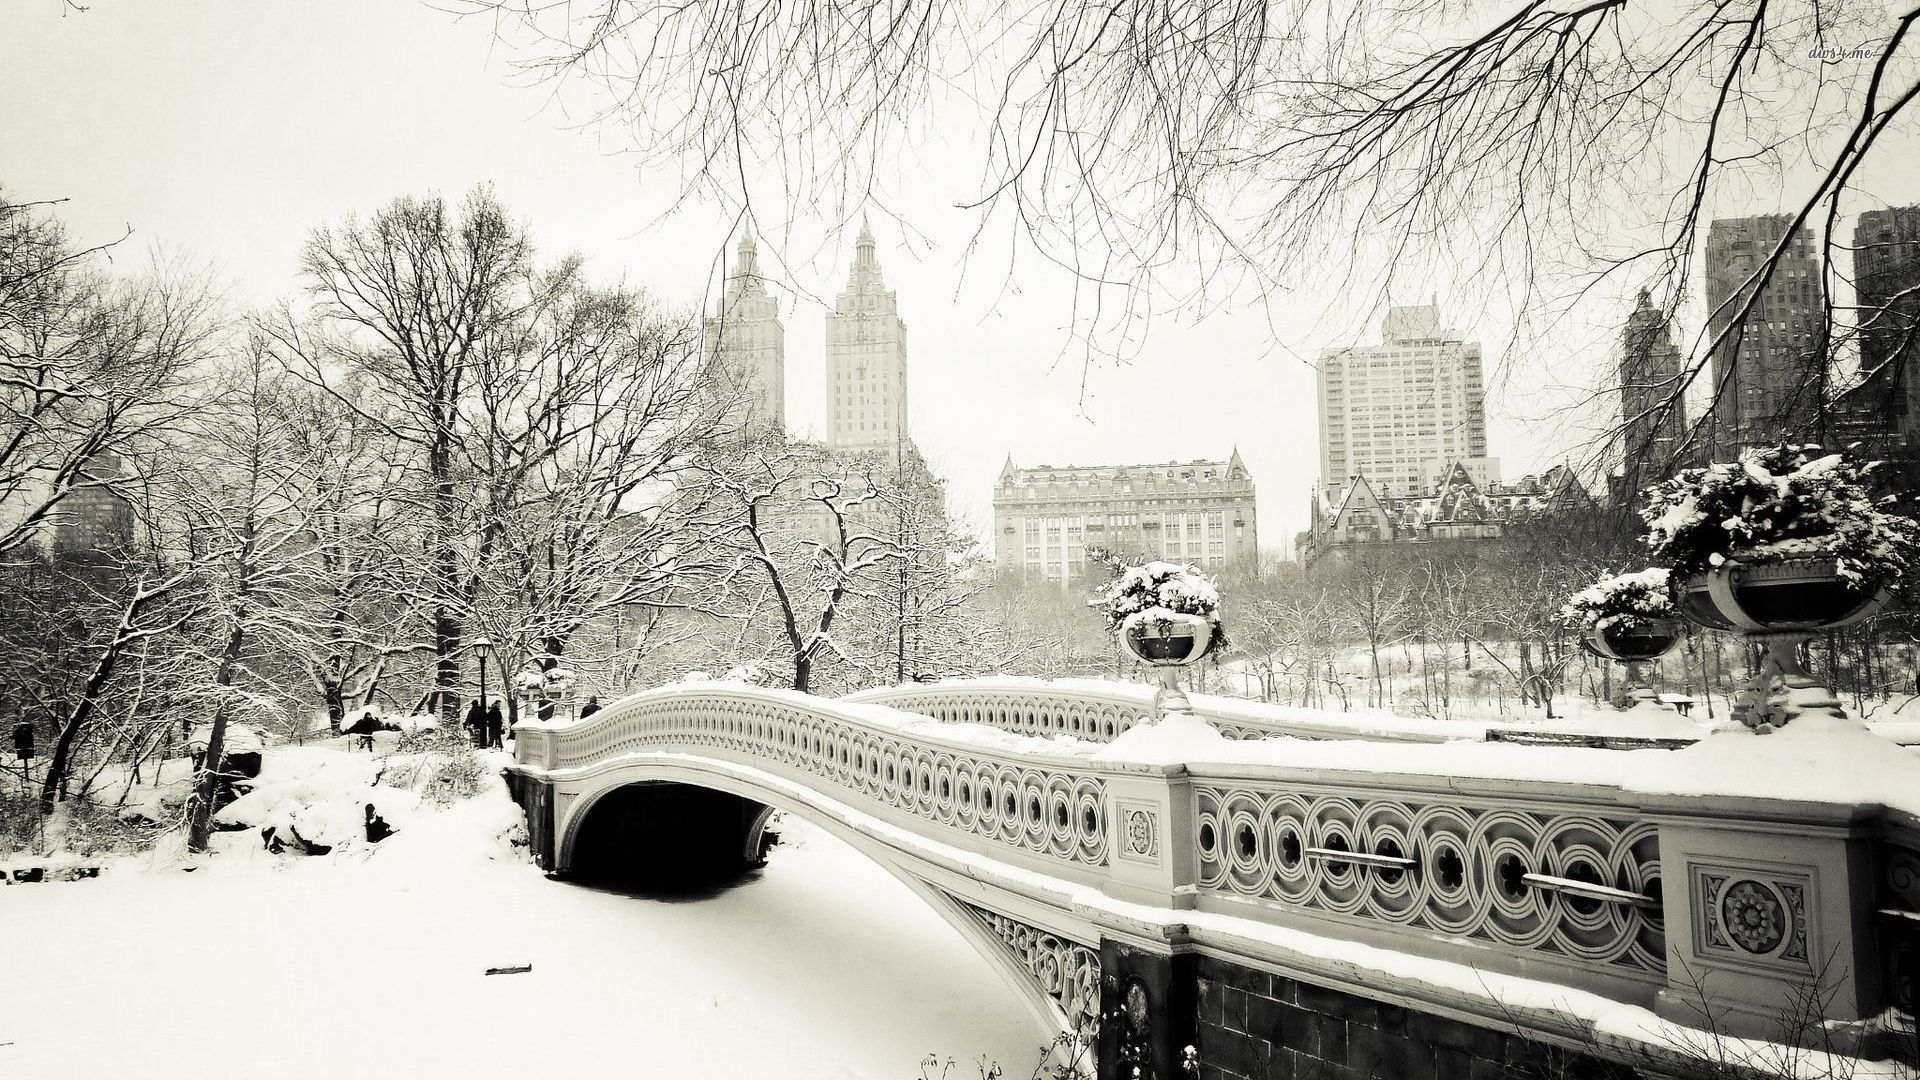 World Winter Snow New York City New York USA Central Park 1920x1080